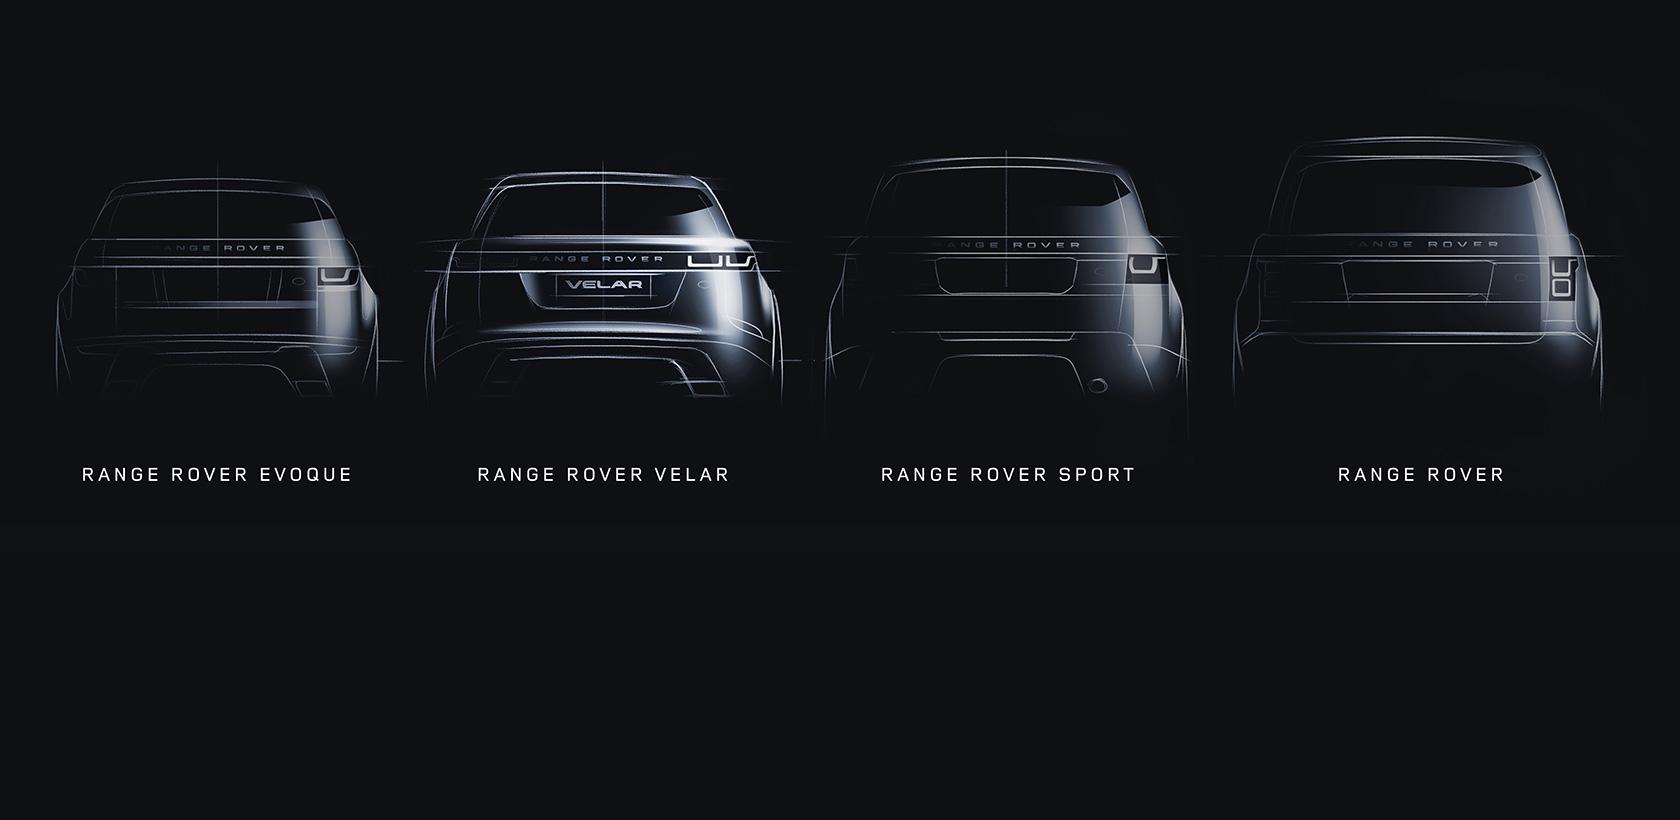 La famille Range Rover s'agrandit avec le Velar